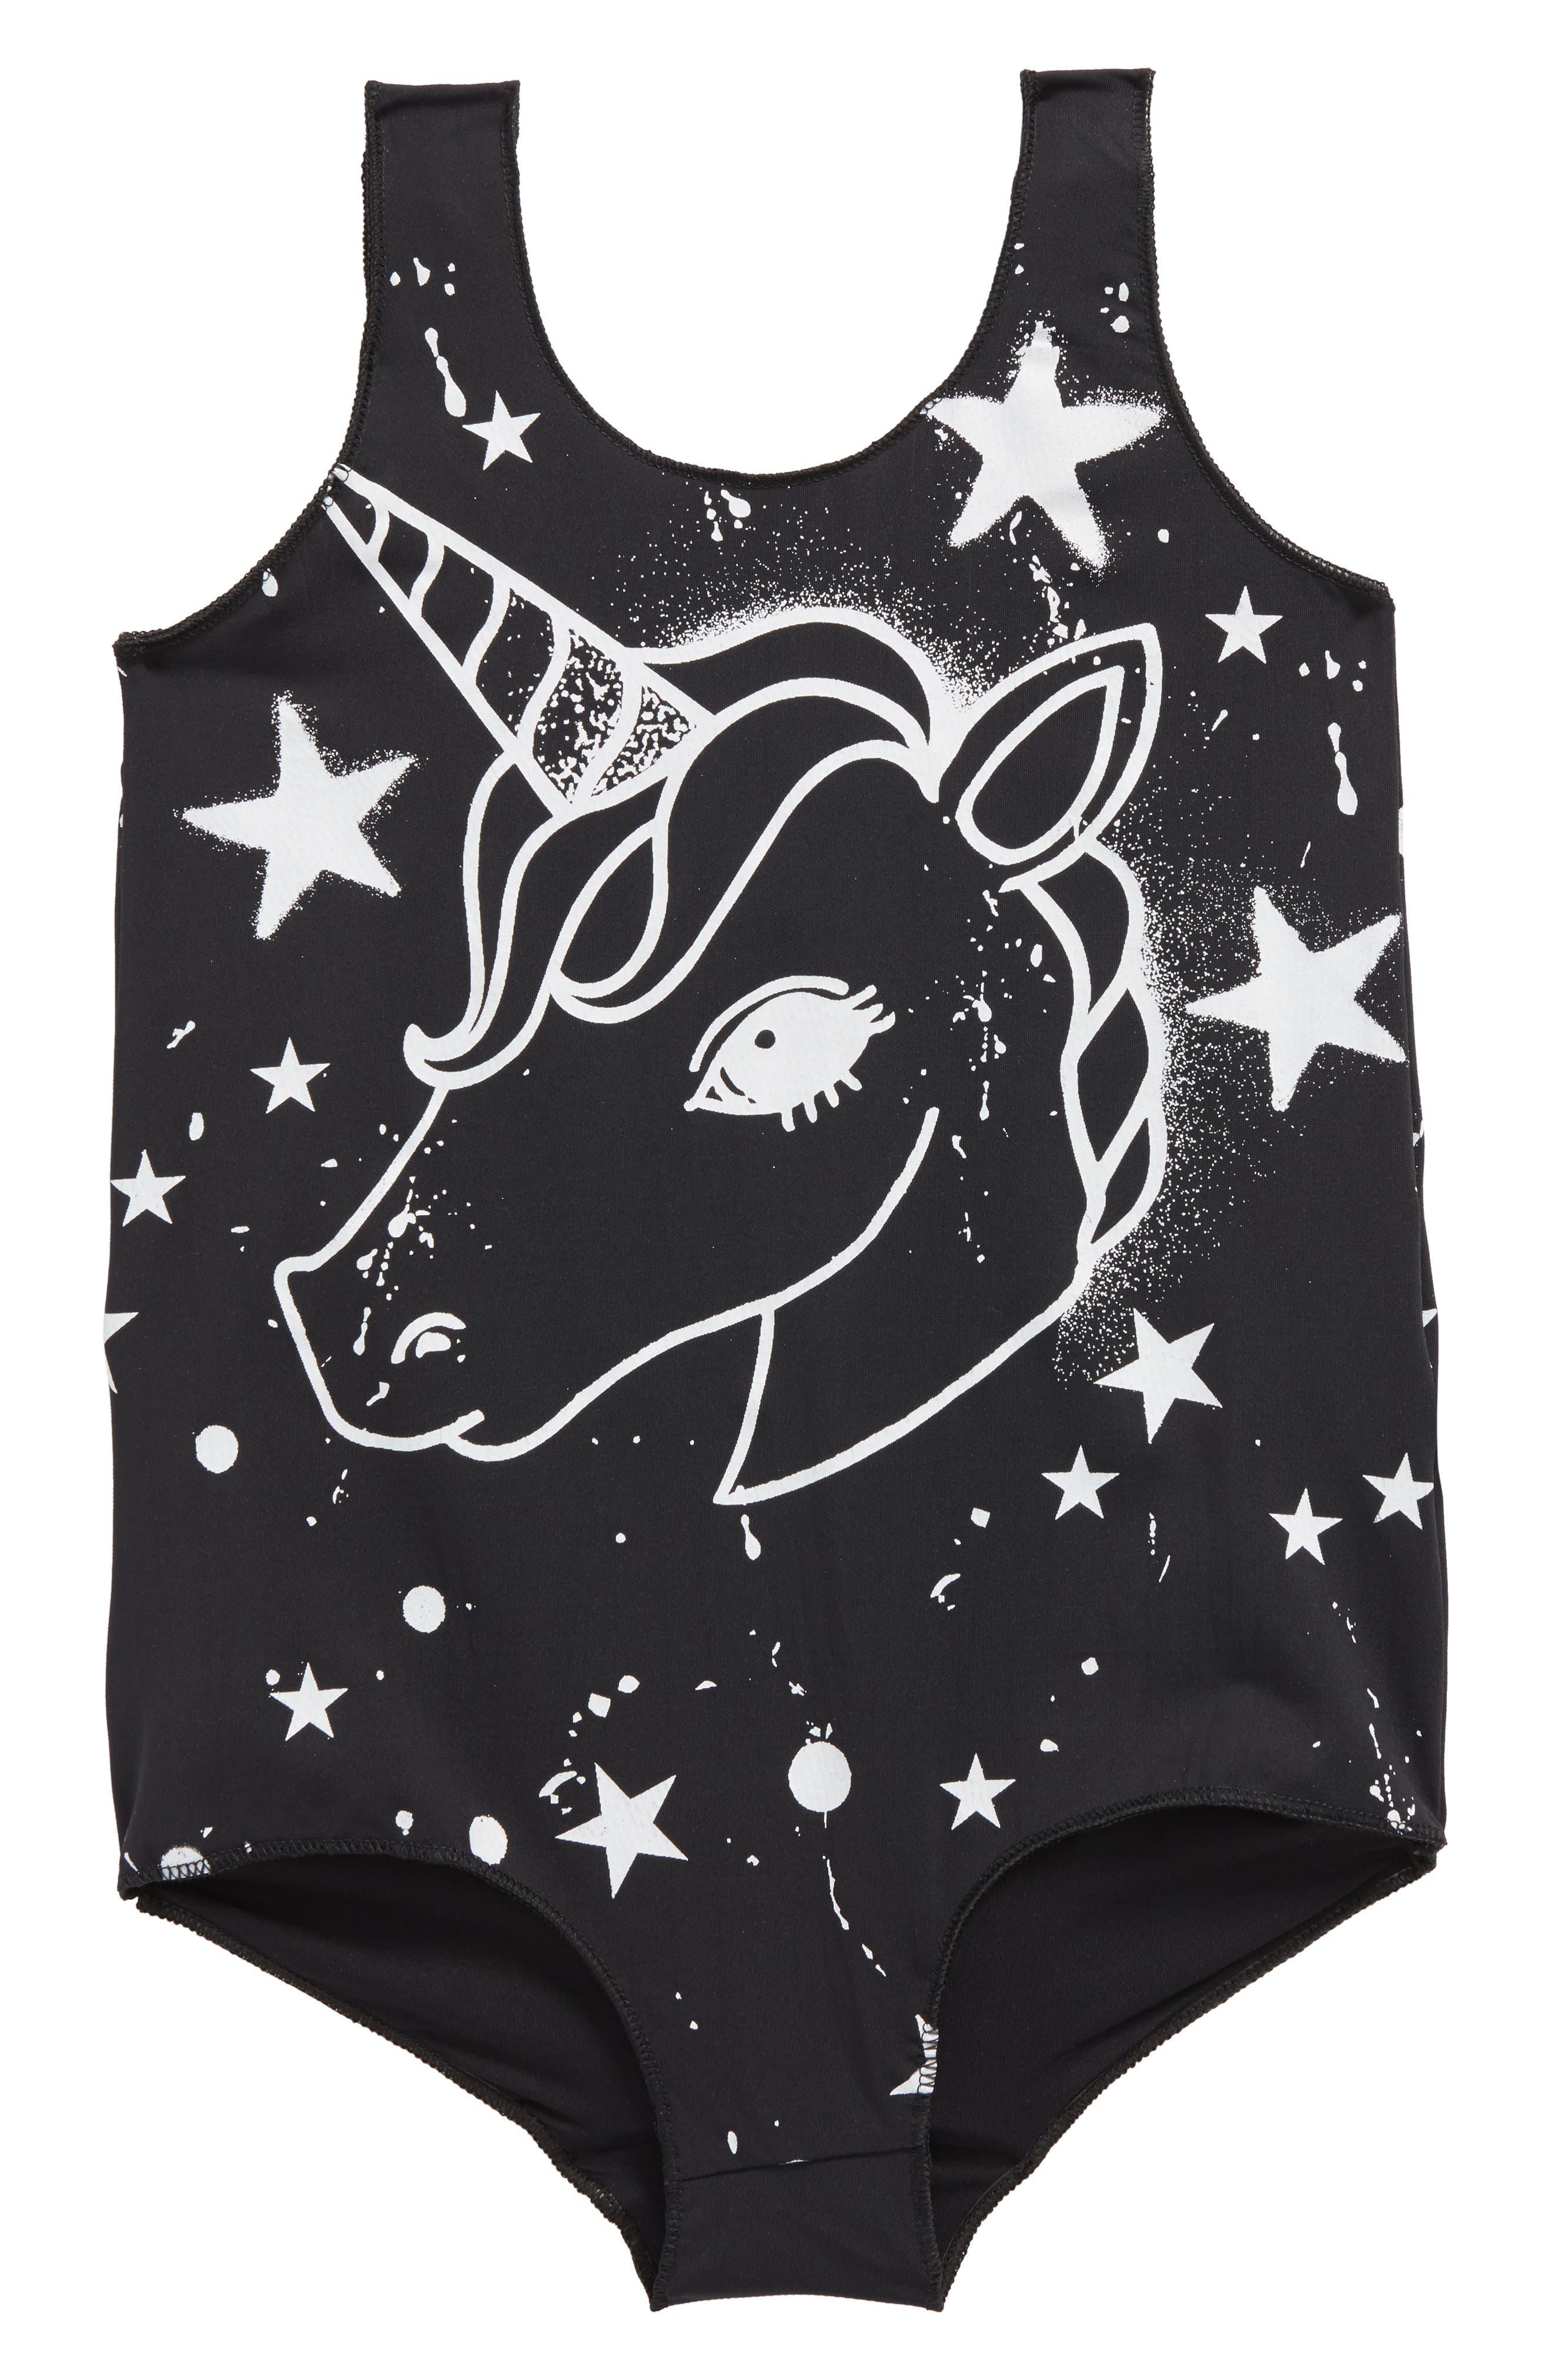 Unicorn One-Piece Swimsuit,                         Main,                         color, 001